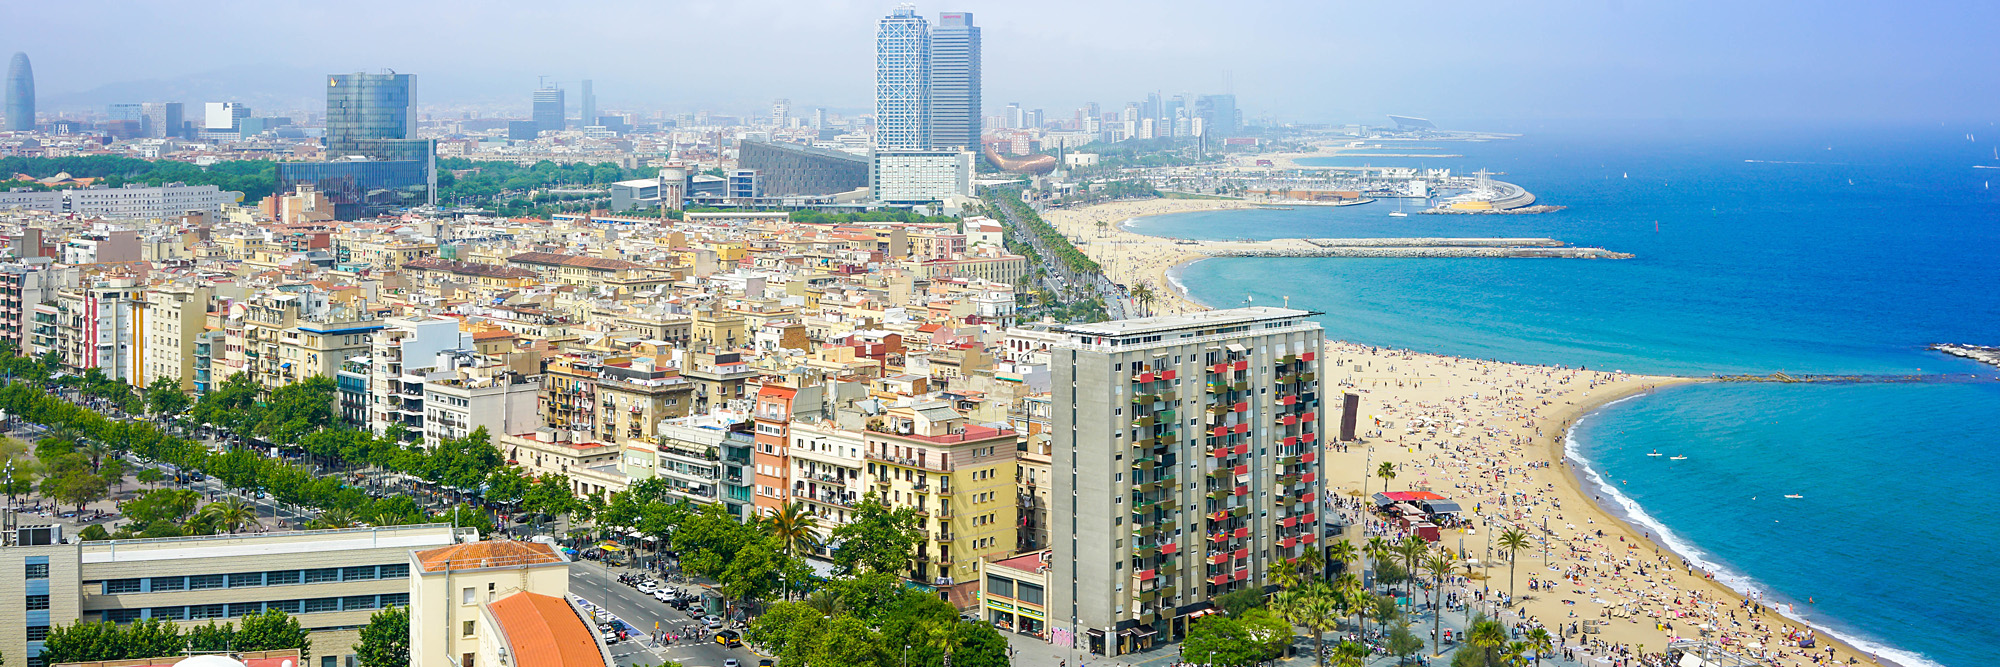 EspanjaMallorca, Barcelona, Costa del Sol, Costa Brava, Costa Dorada, Costa Blanca jne.